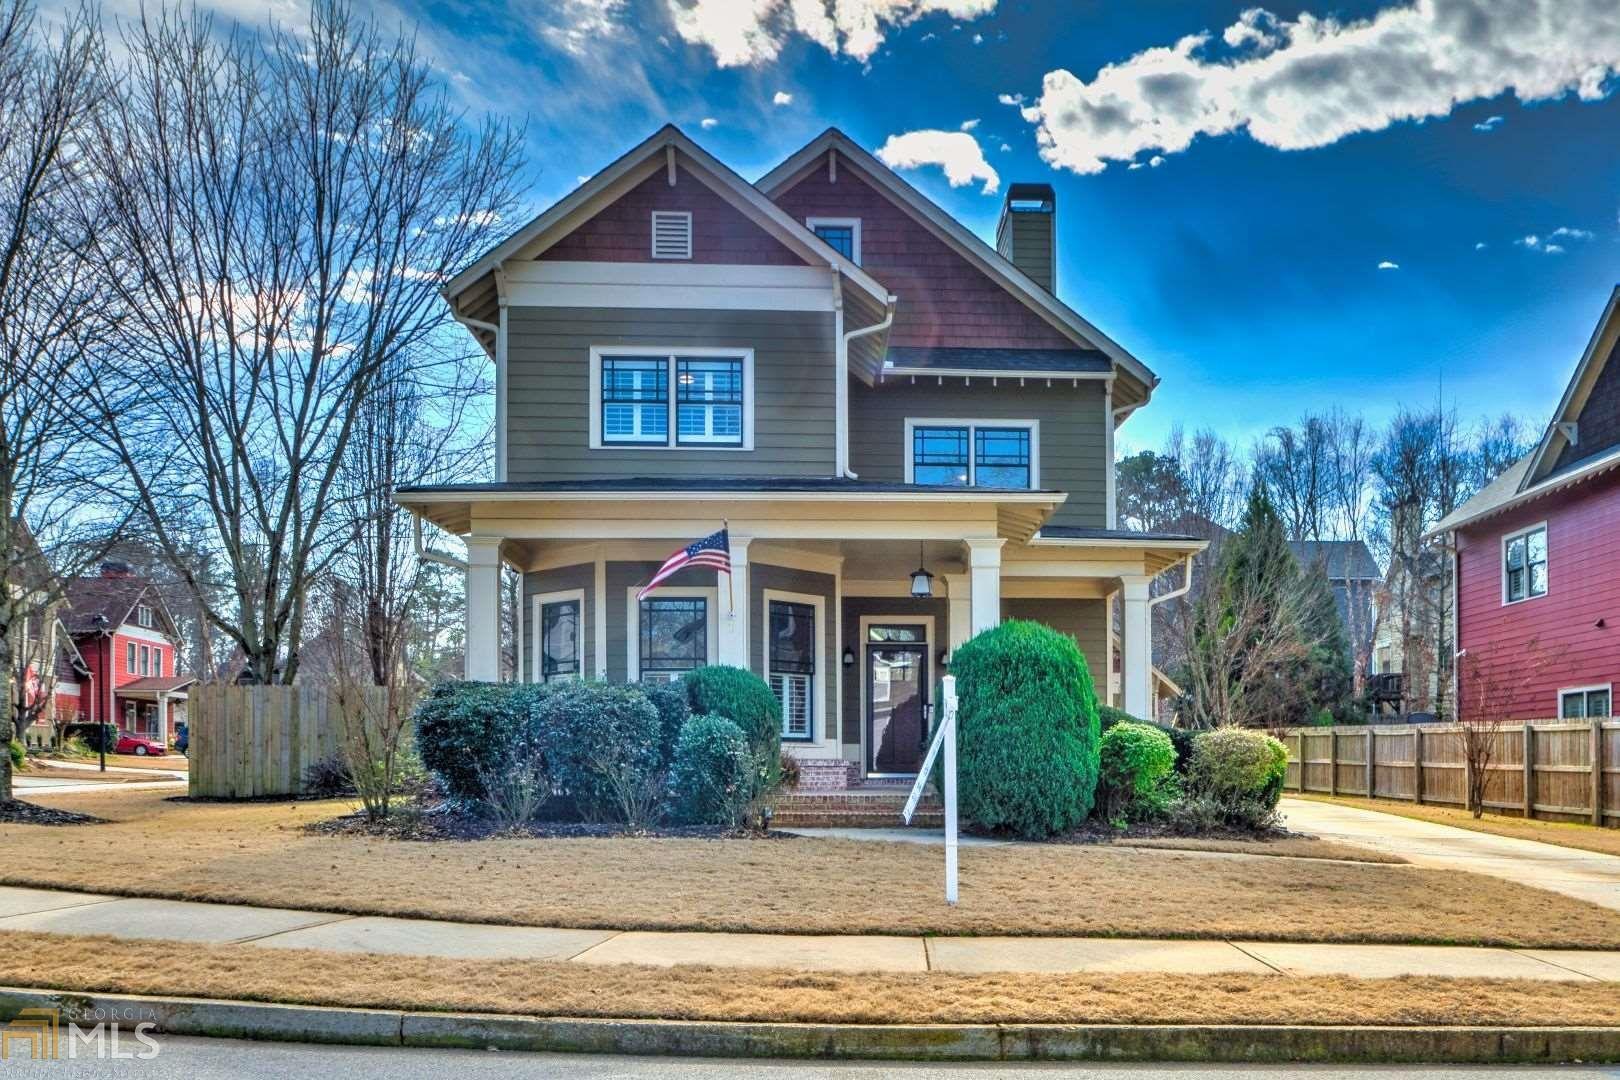 1831 Stoney Creek Dr, Atlanta, GA 30316 - MLS#: 8913067